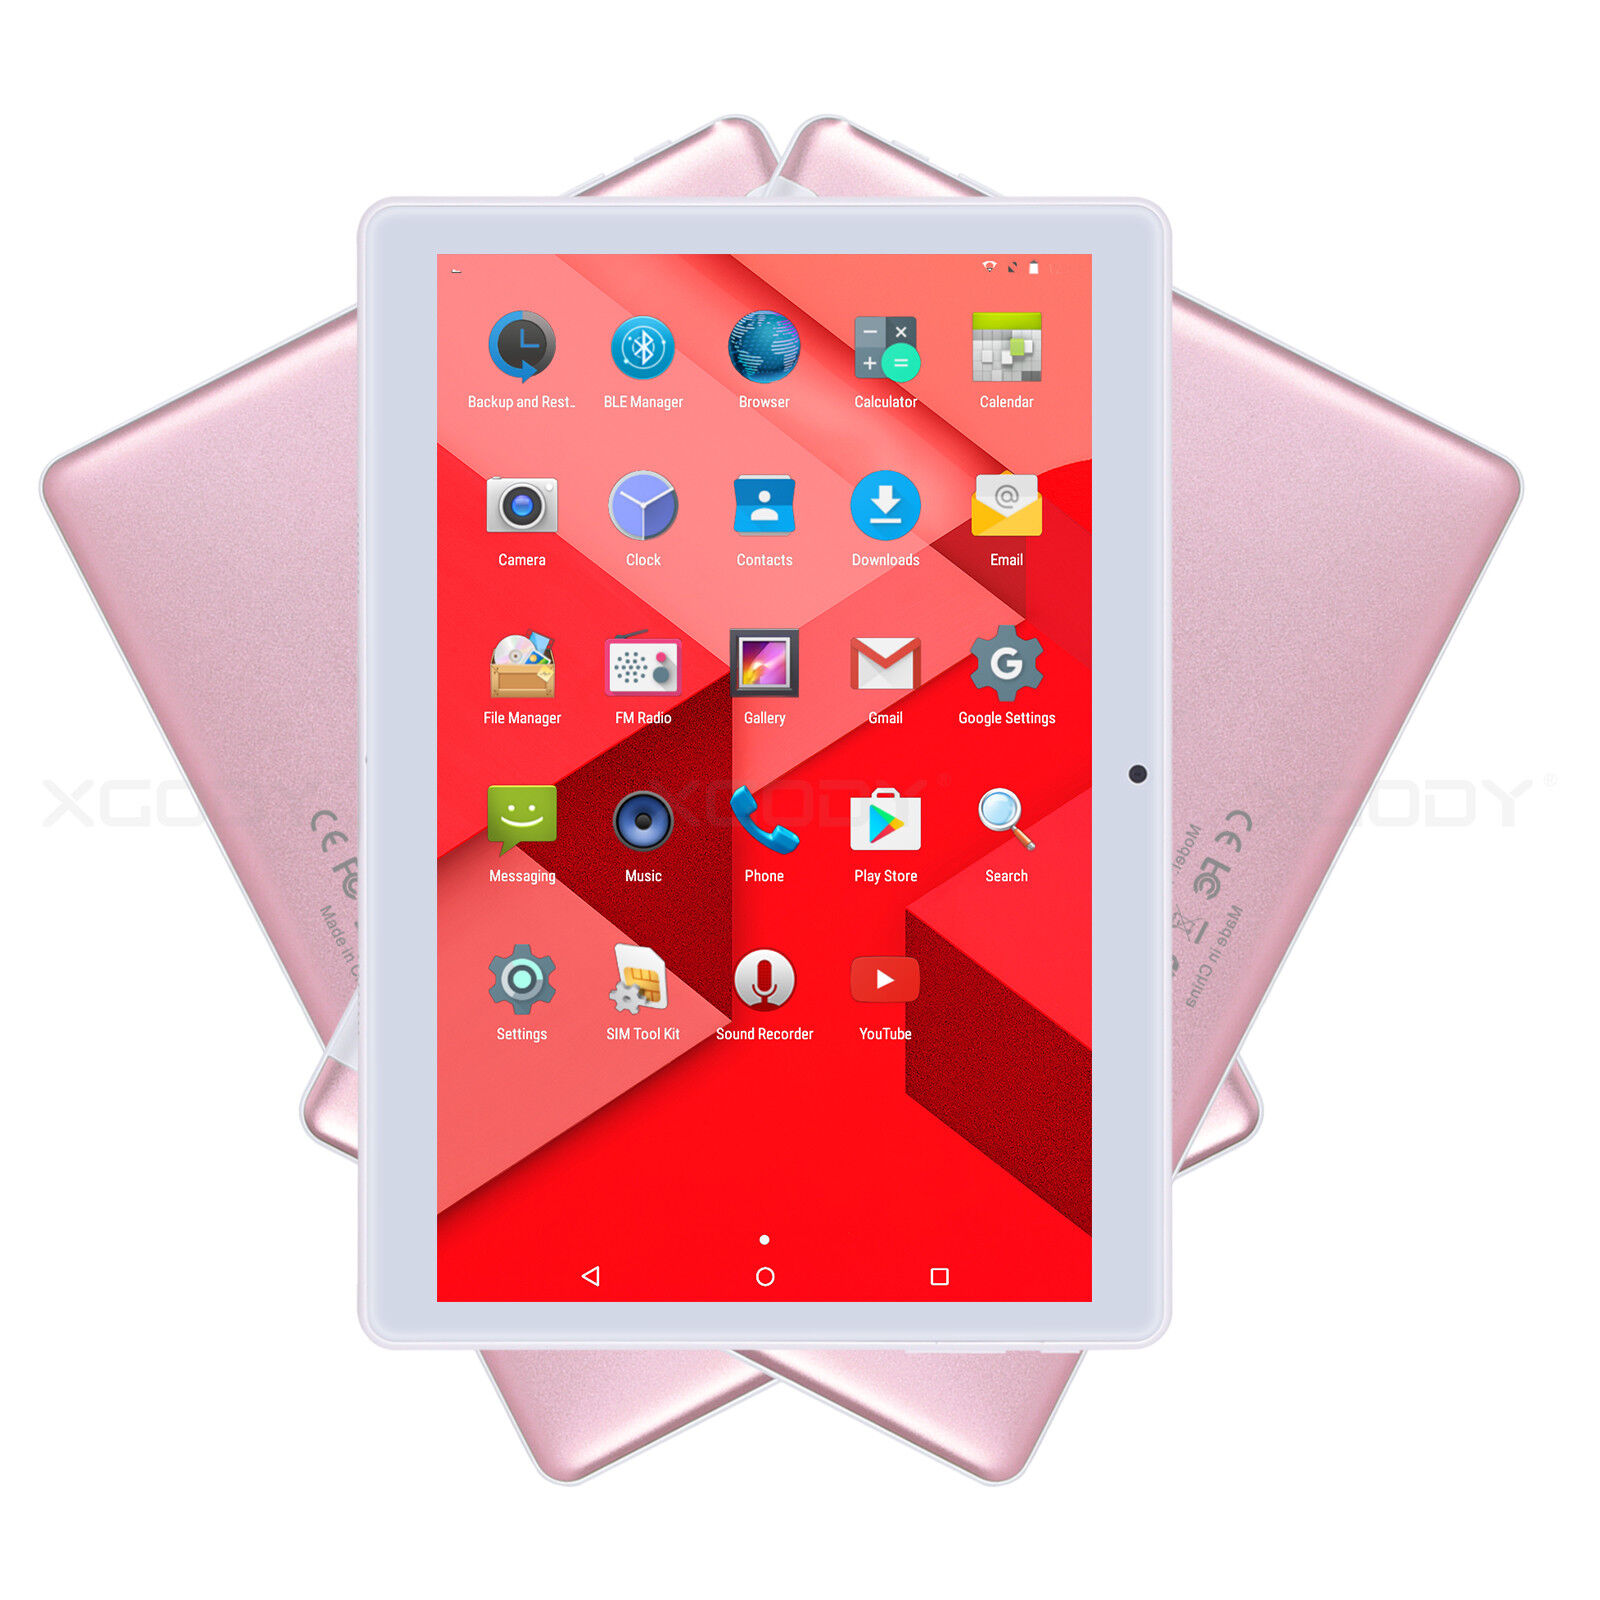 XGODY TB02 10.1'' Android 7.0 Tablet PC Quad Core 3G Dual SIM 1+16GB IPS HD Pink